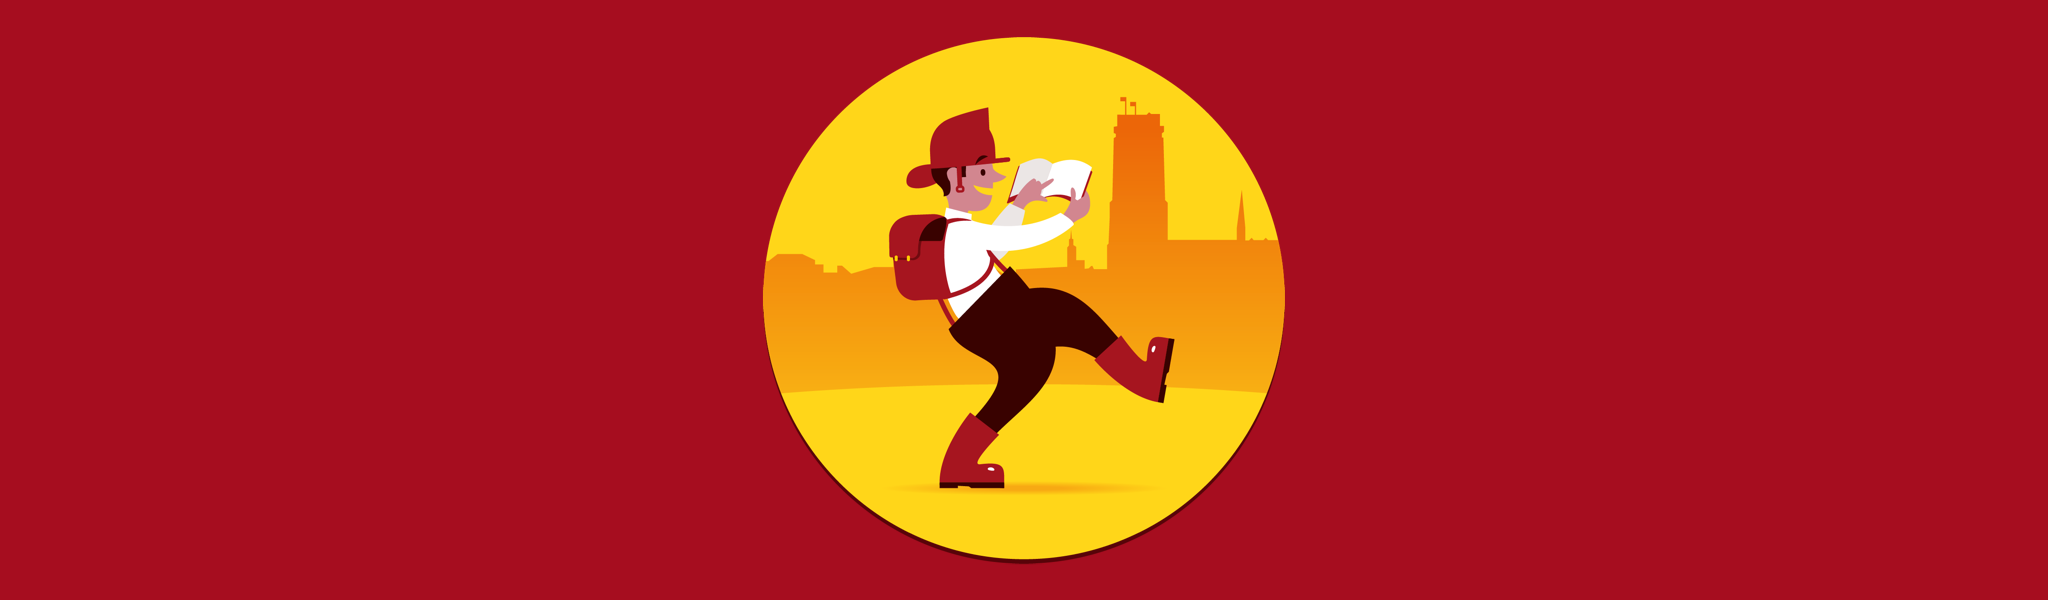 Logo Maneblusser zoekt